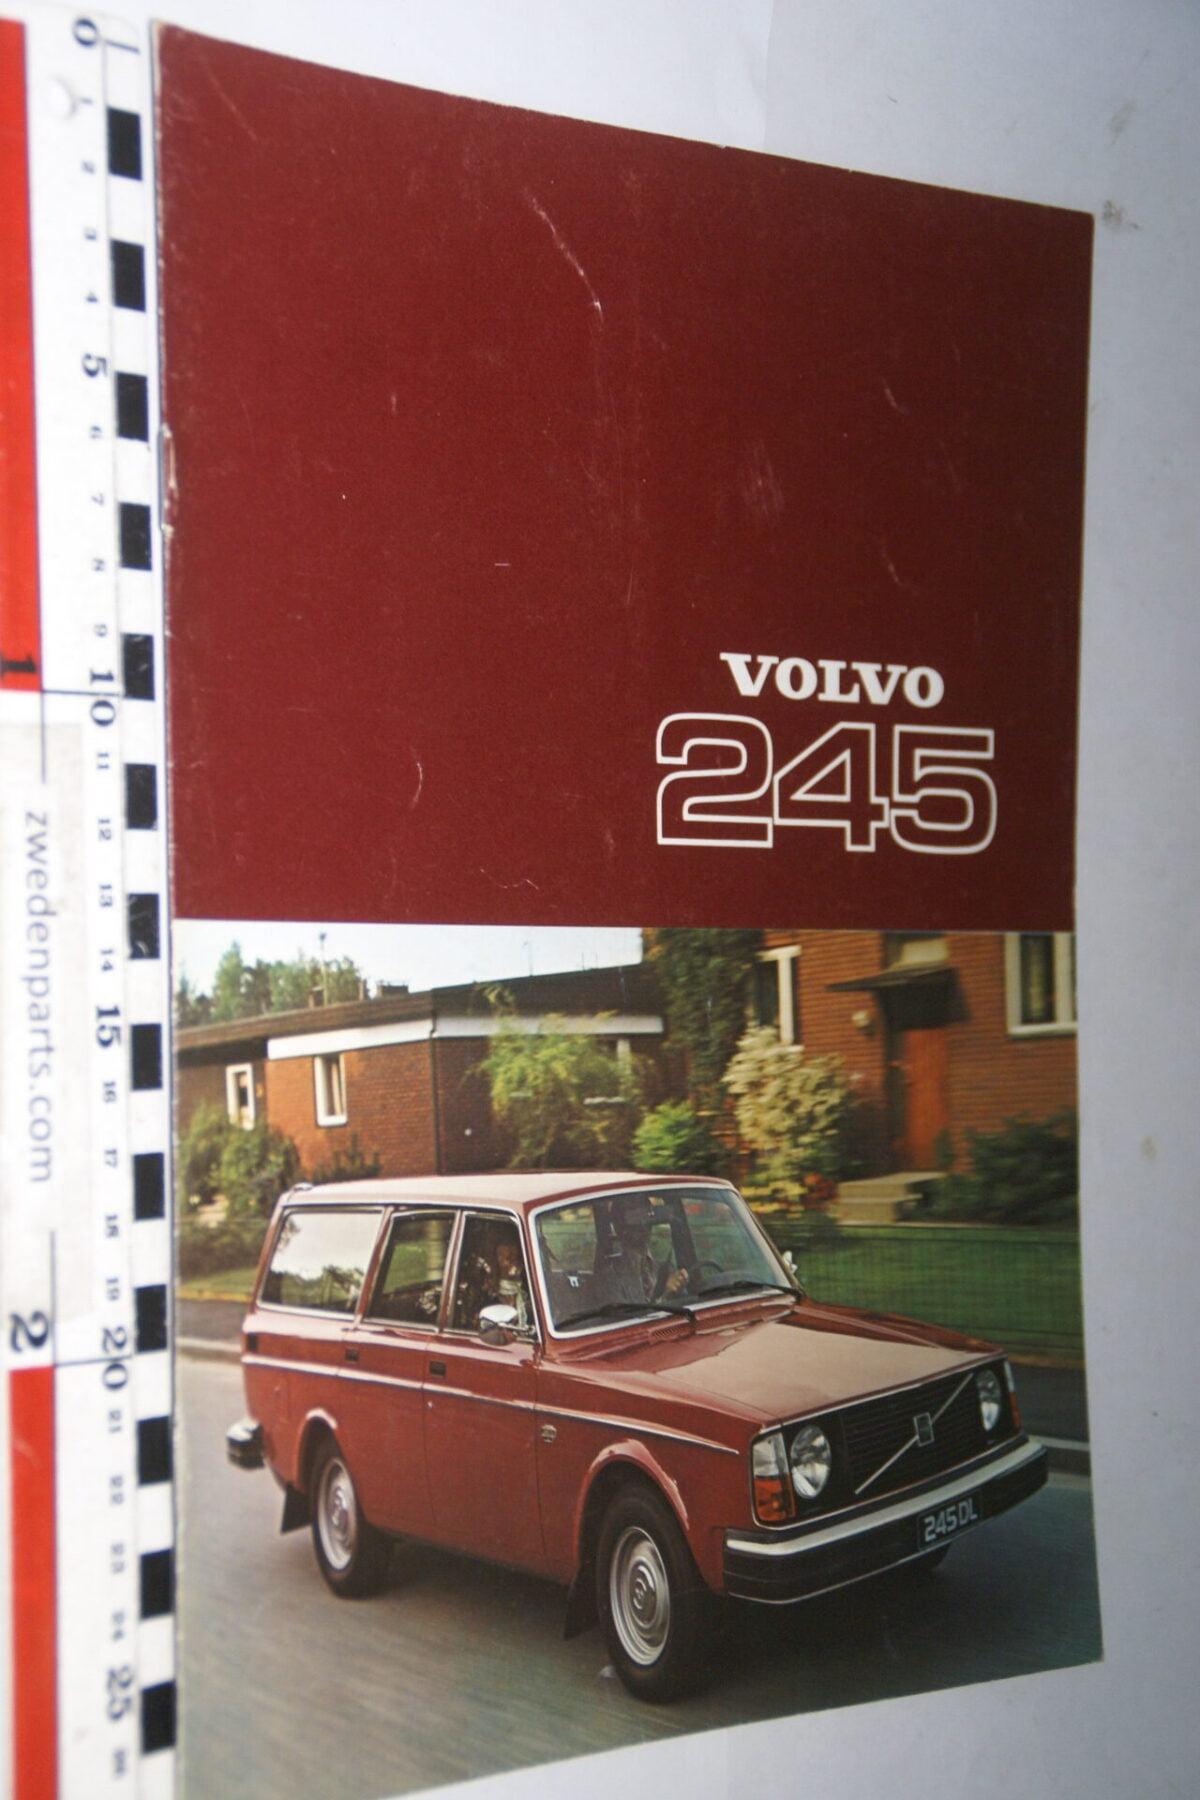 DSC07629 1977 originele brochure Volvo 245 nr RSPPV 4051-baf22896